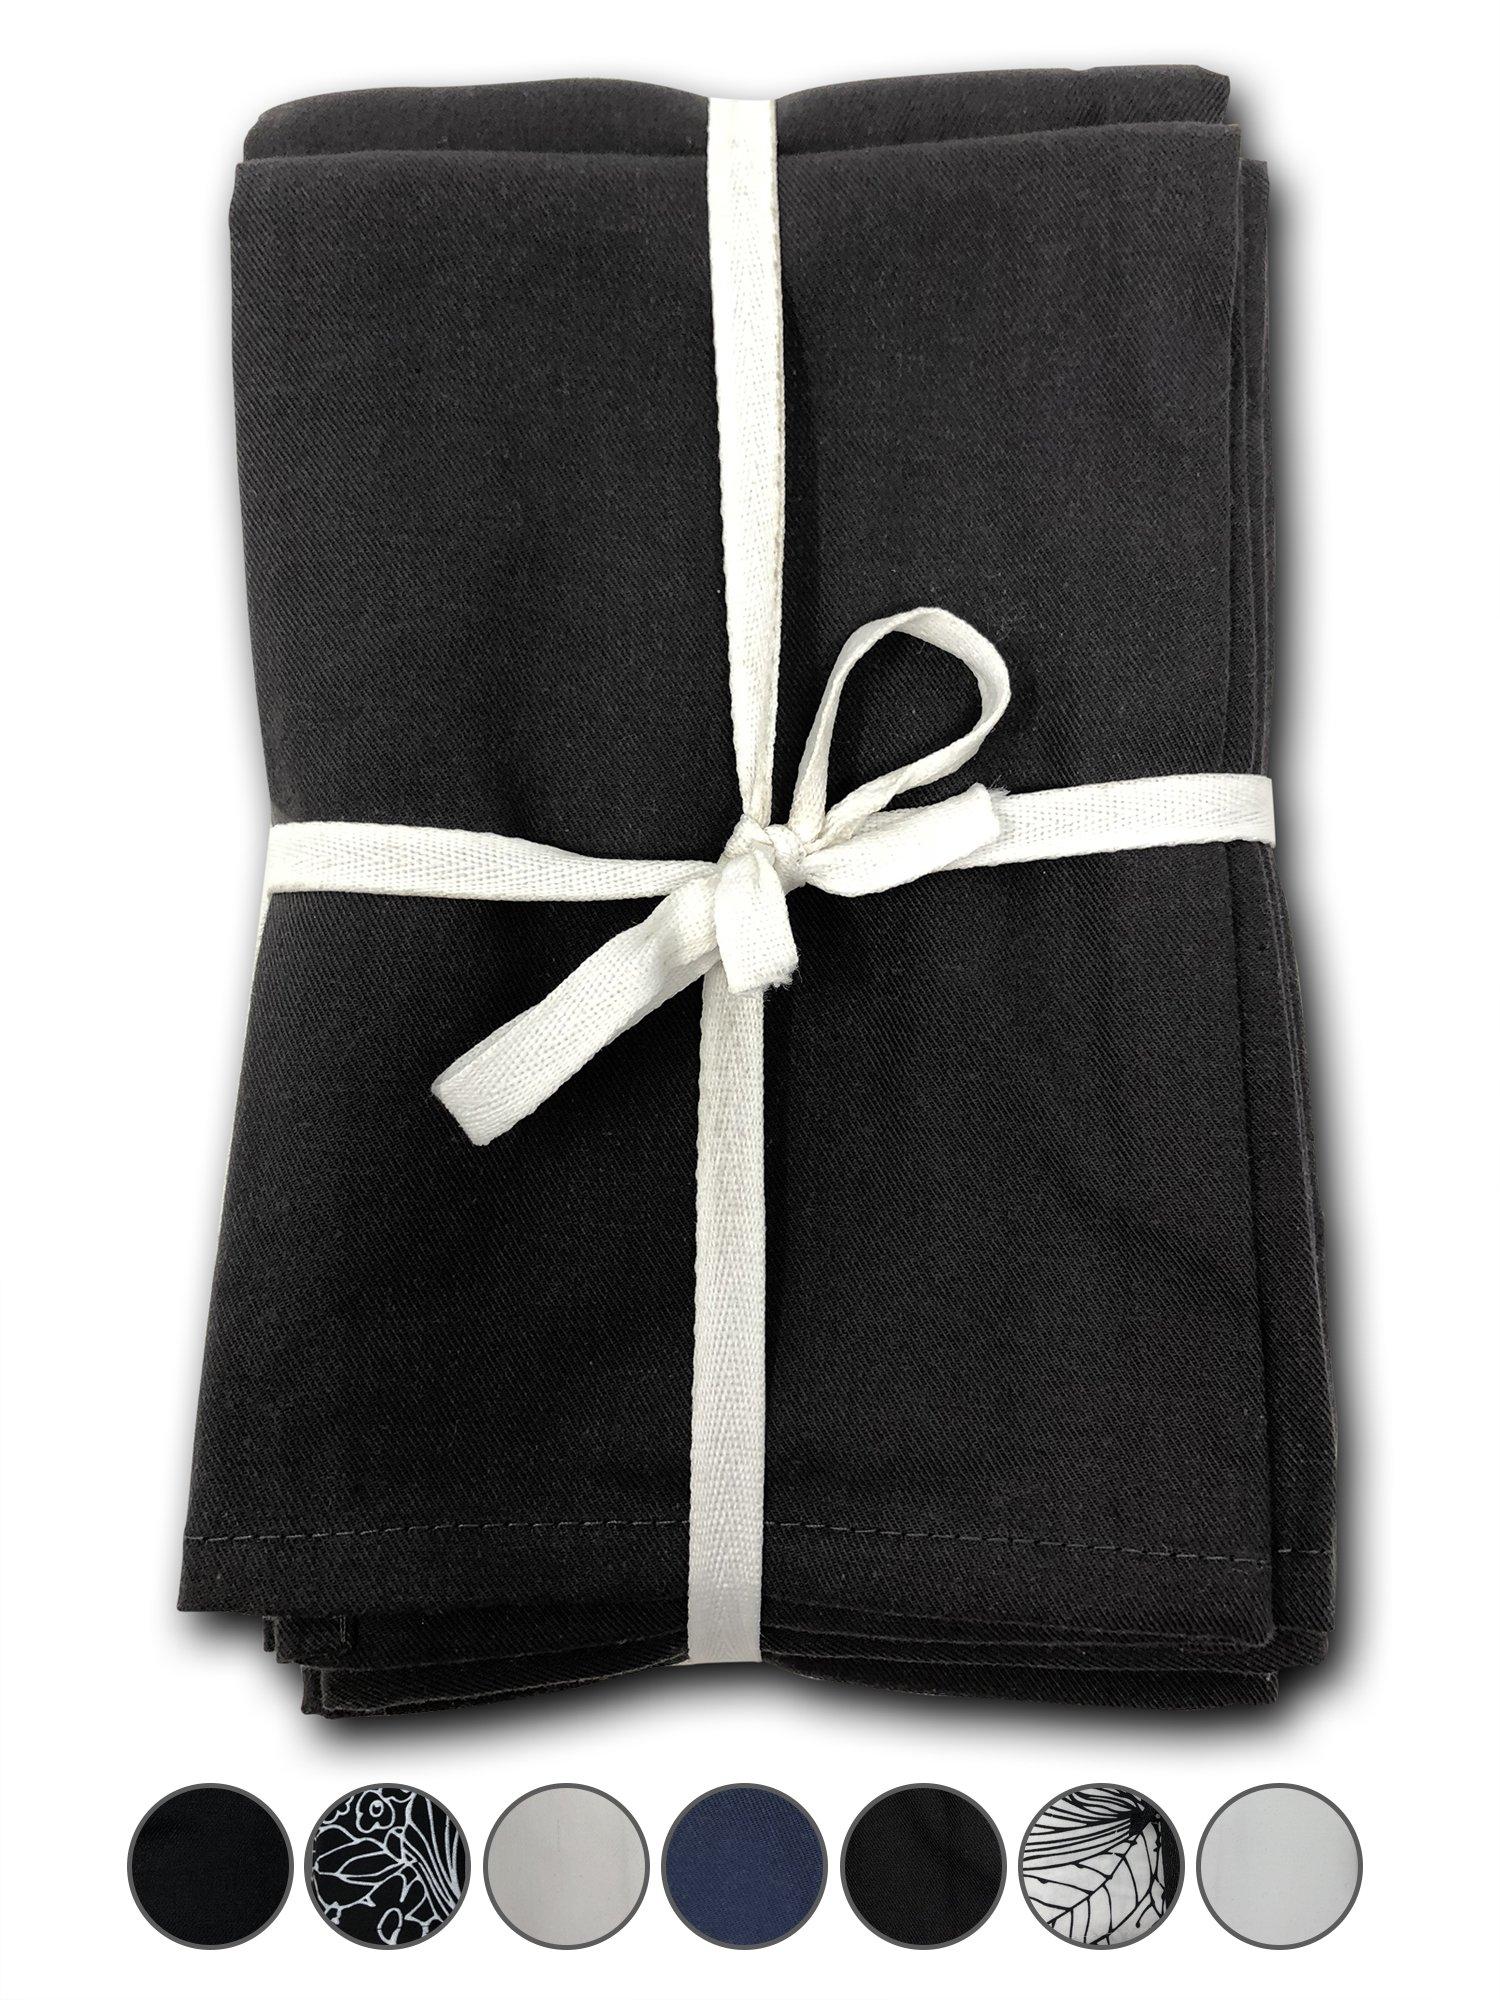 MoLi Products 100% Egyptian Cotton Cloth Dinner Napkins 12 Pack Lunch Linen - Decorative Reusable Fabric Table Linens Servilletas de Tela Restaurant Wedding Luncheon Napkin (Gray Grey)